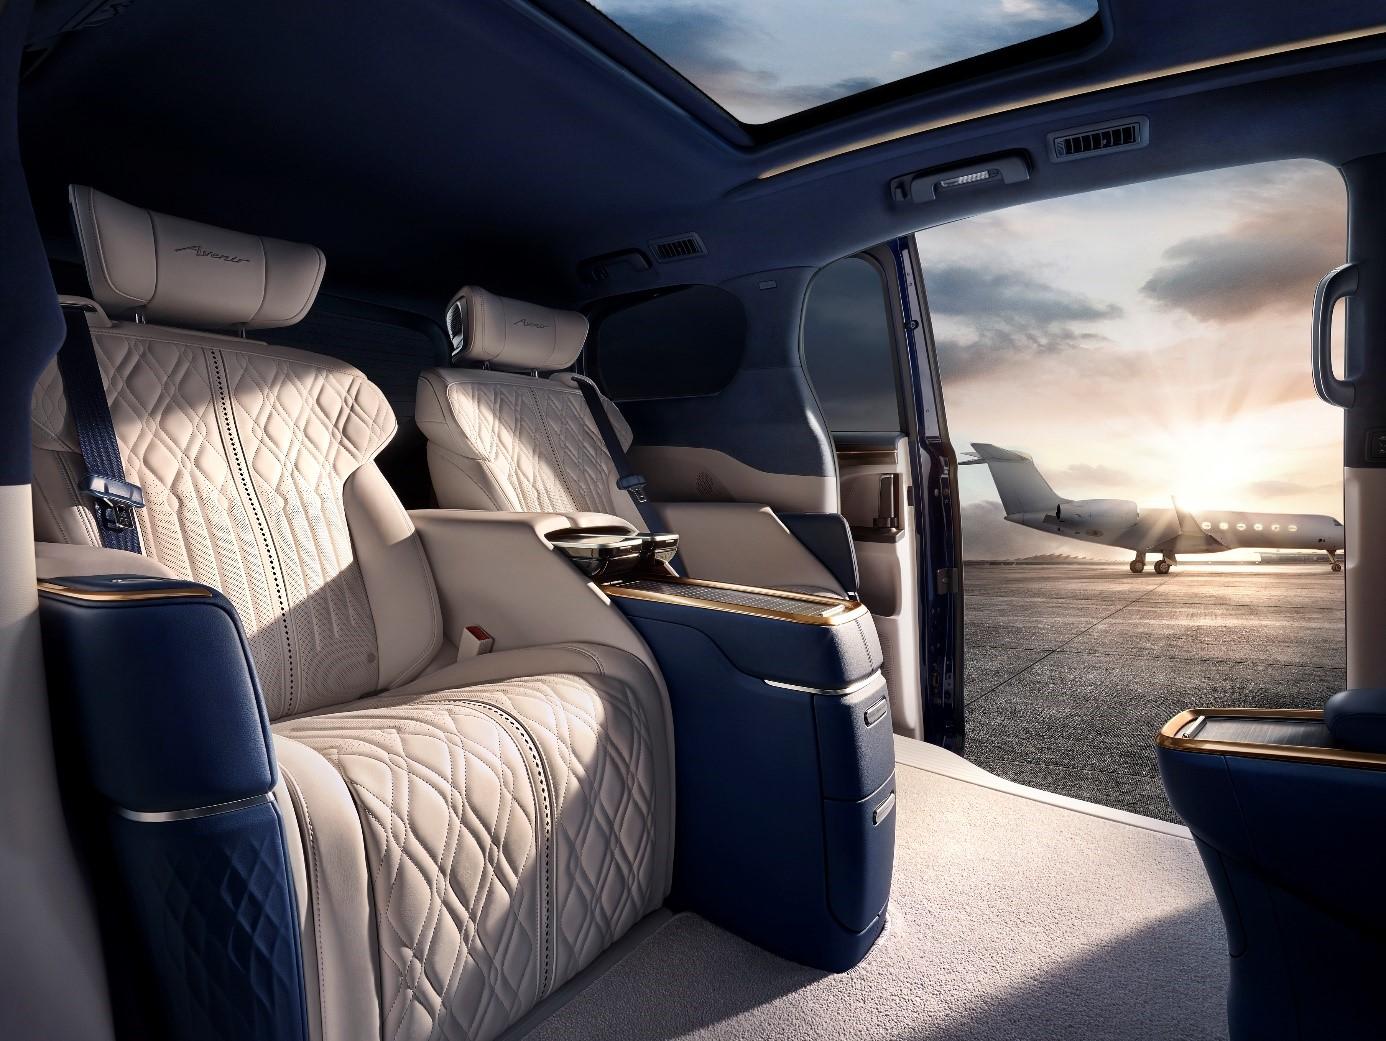 2020-Buick-GL8-Avenir-China-spec-13